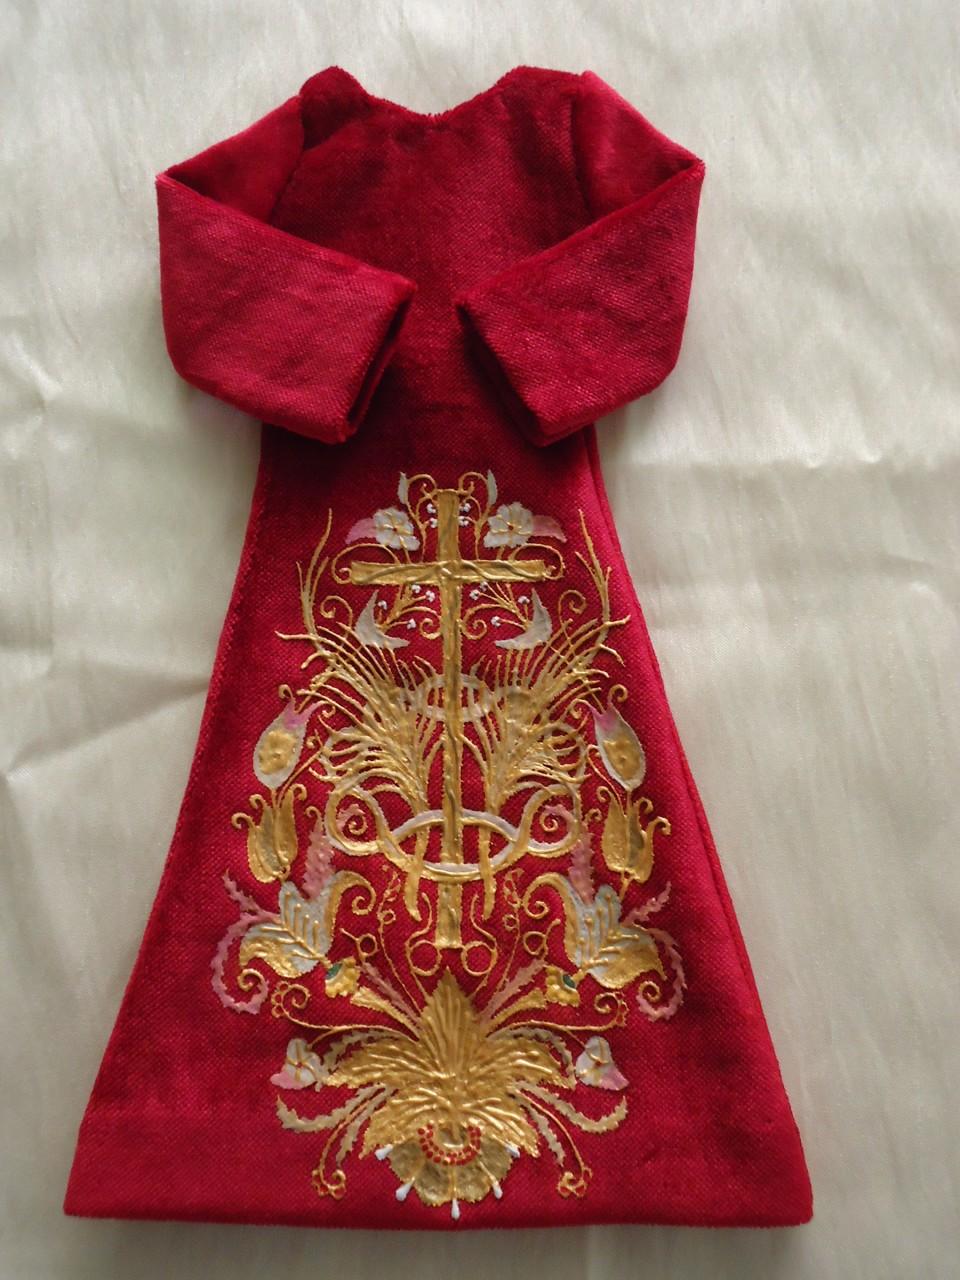 Réplica de la saya procesional de la Virgen del Gran Poder de León